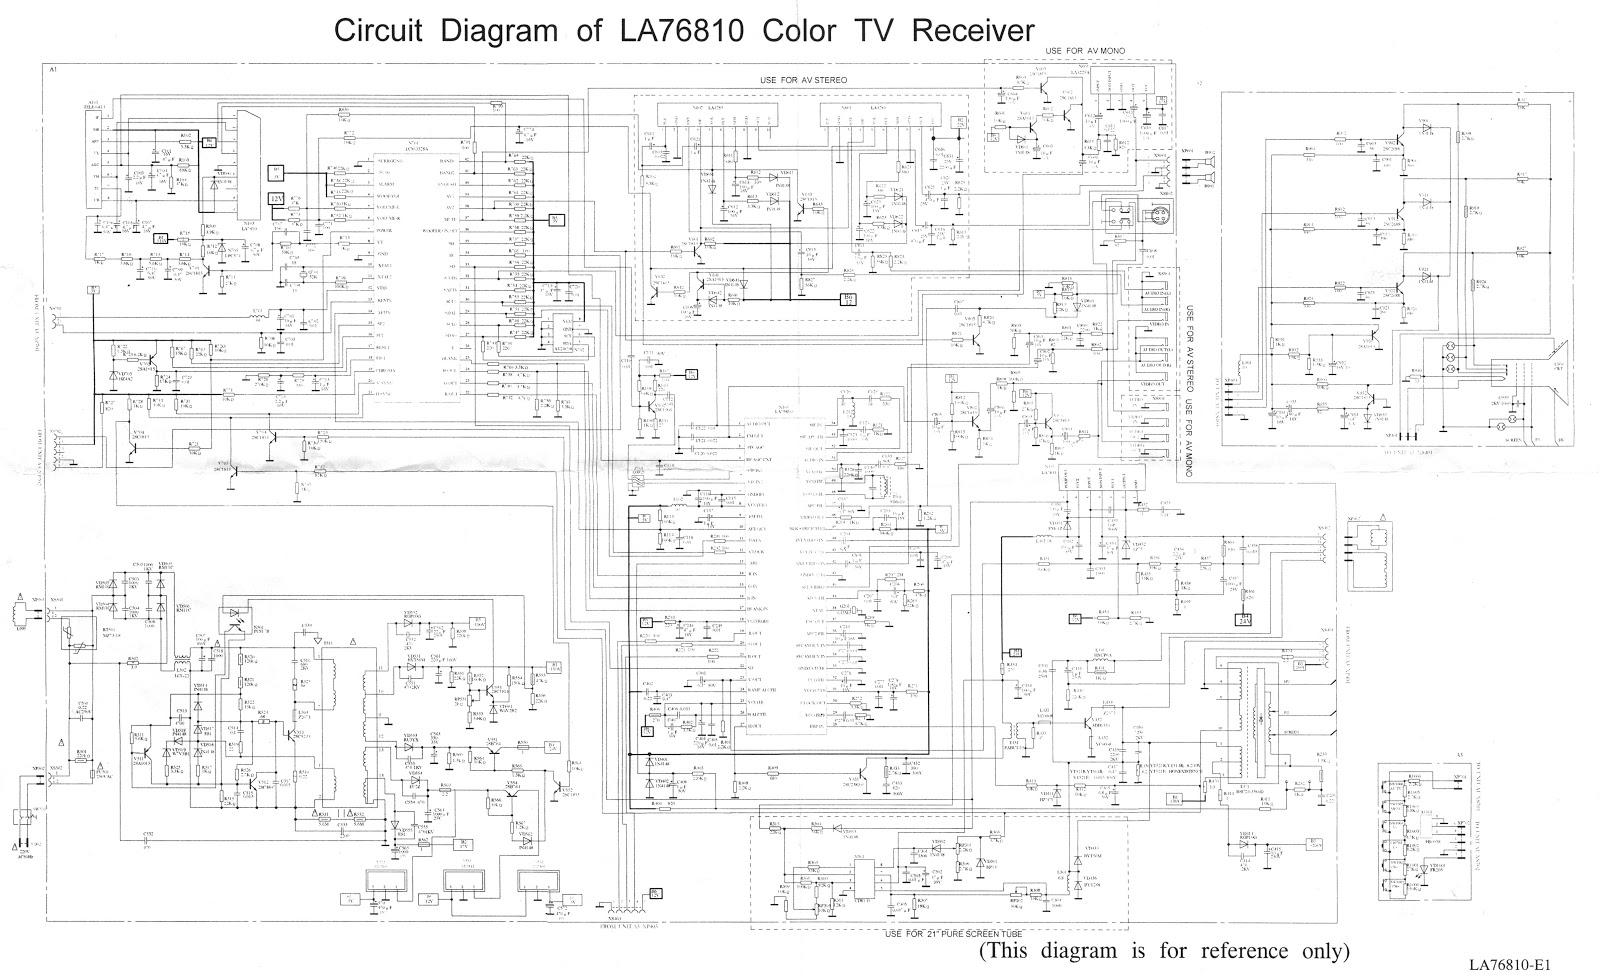 SERVIS TV SALATIGA (lcd/led/tabung): Circuit diagram of LA